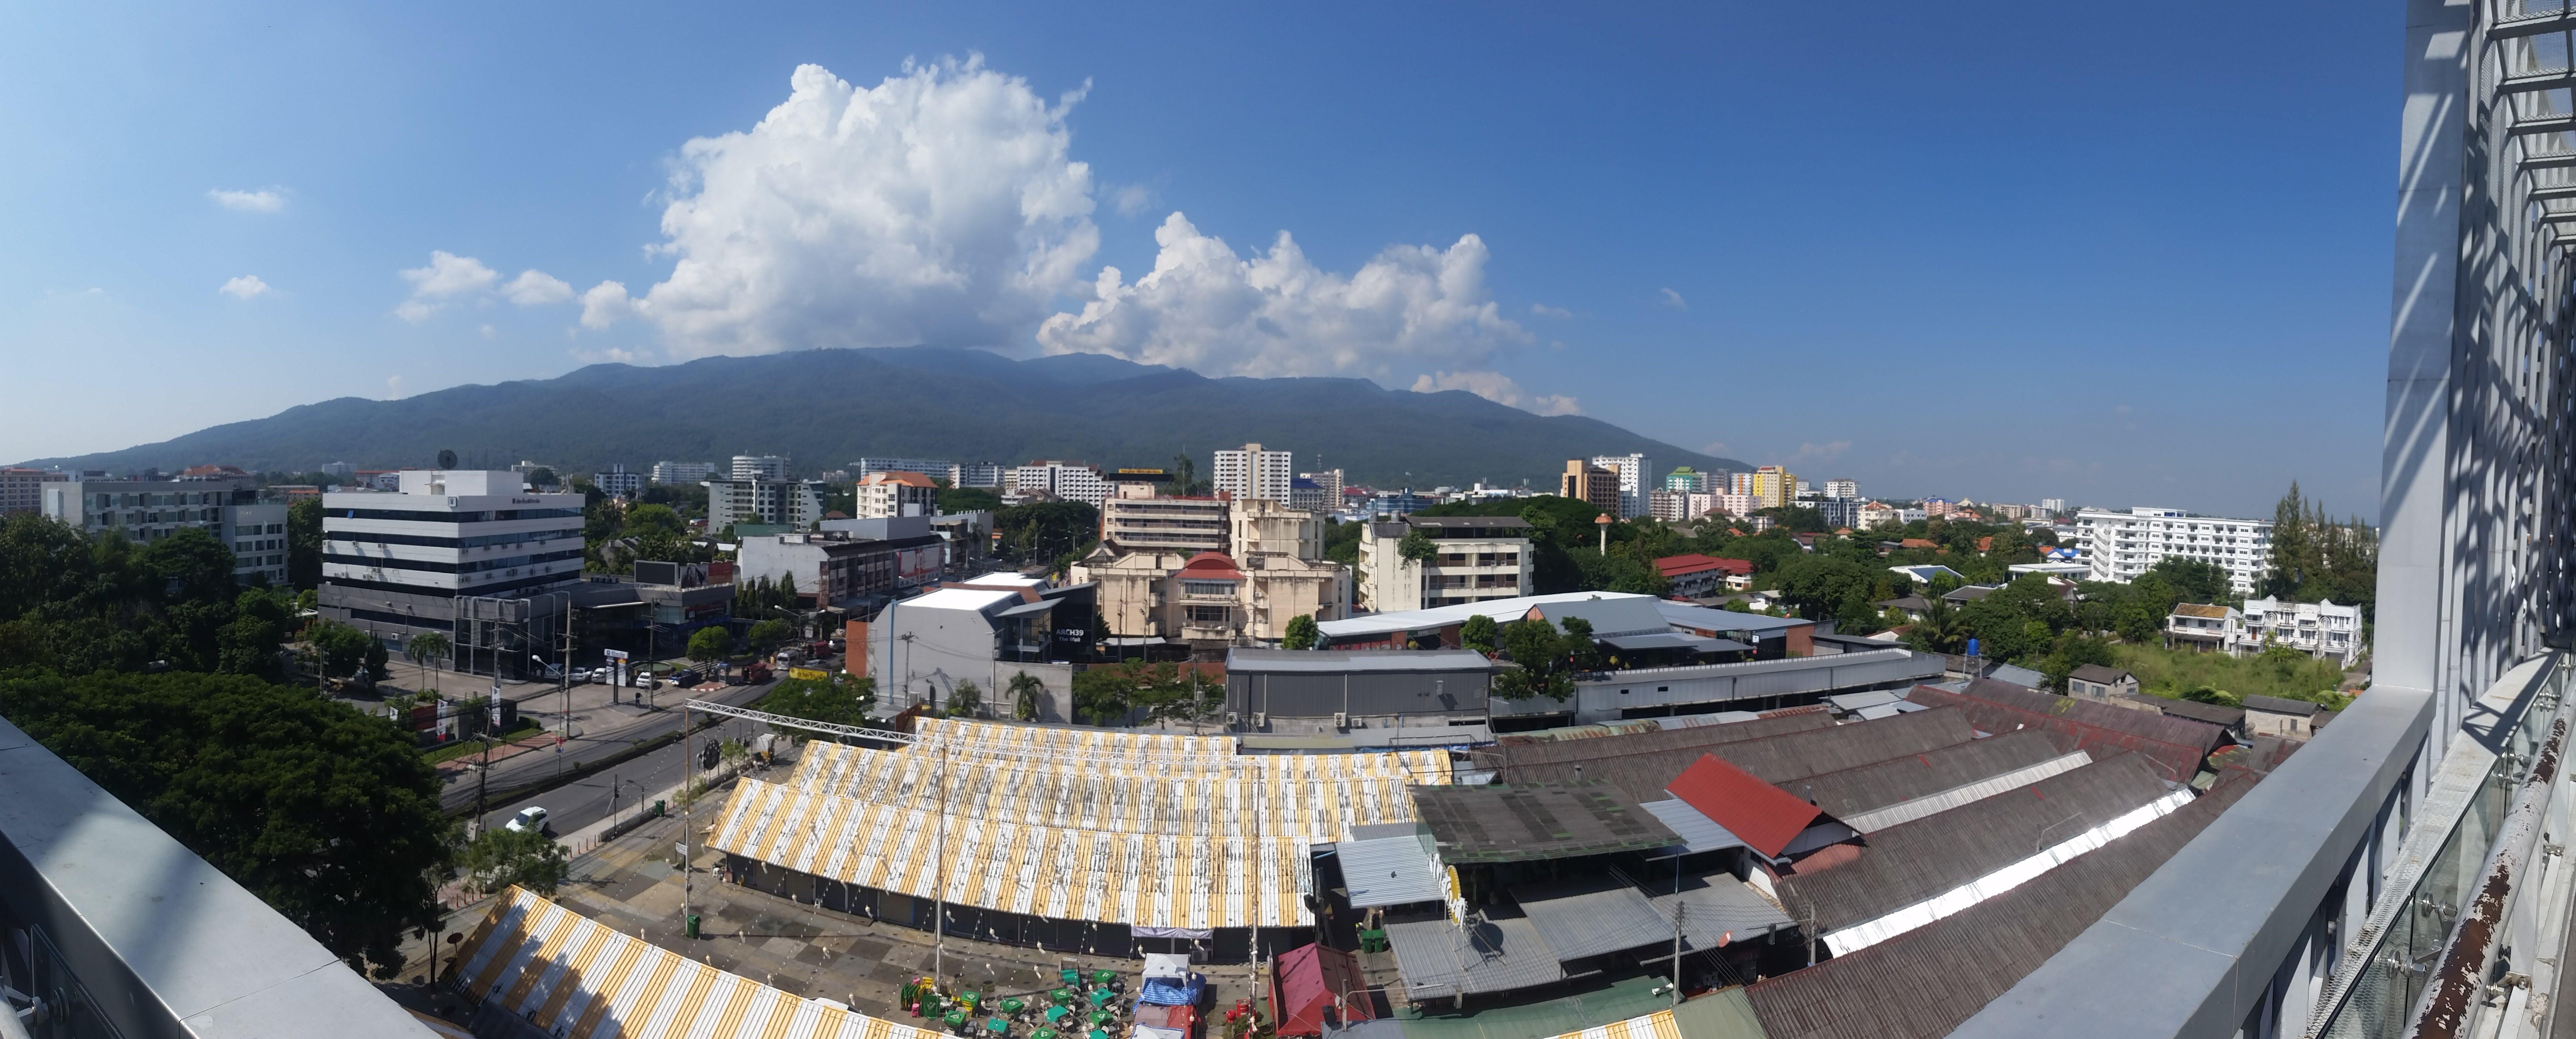 View of Doi Suthep from the Maya shopping center.